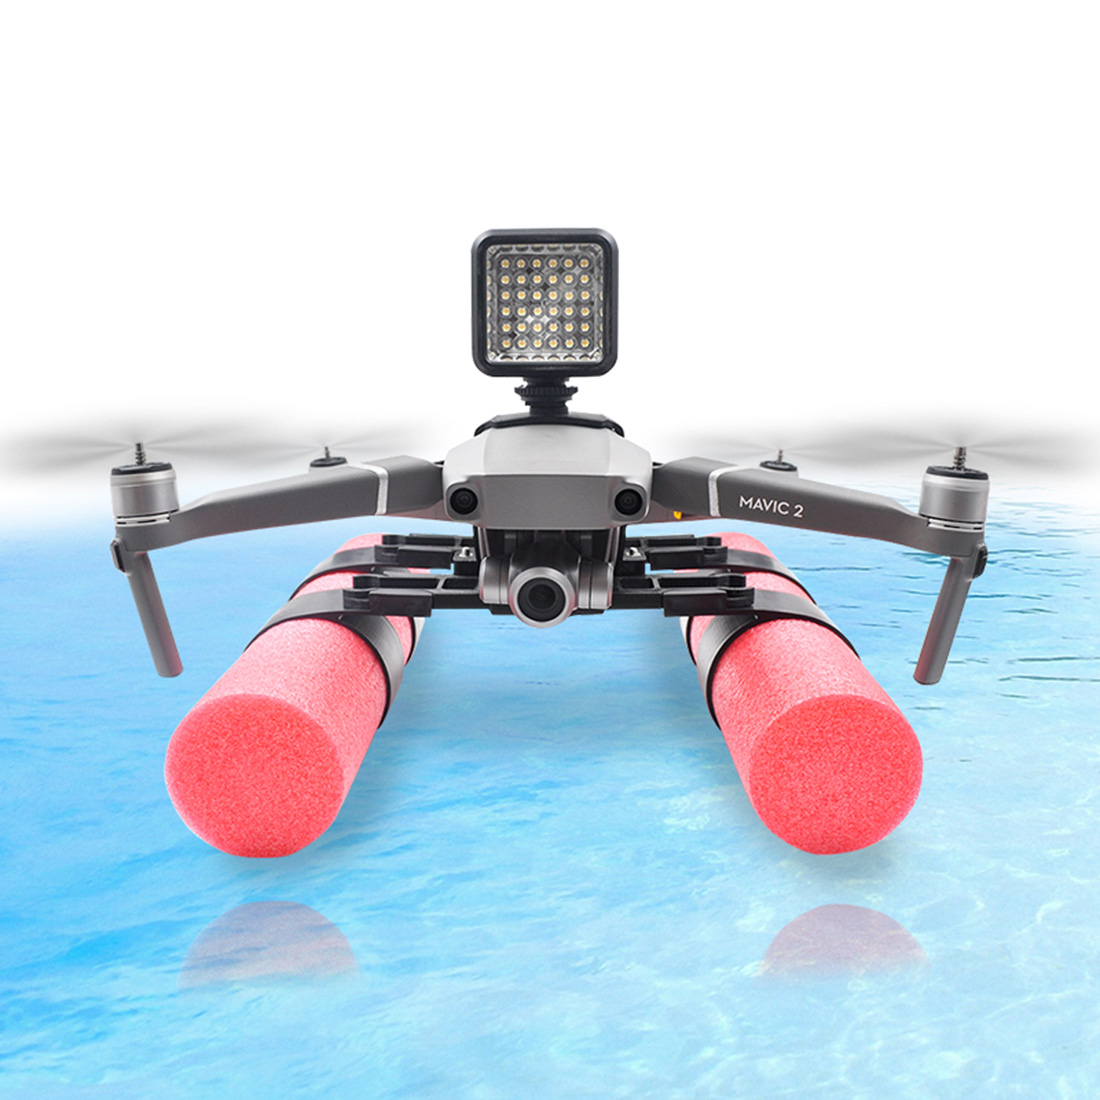 Extended Landing Gear Skid Training Floating Bobber Fixer Set For DJI Mavic 2 Pro/ Mavic 2 Zoom With  Buoyancy Rod Holder